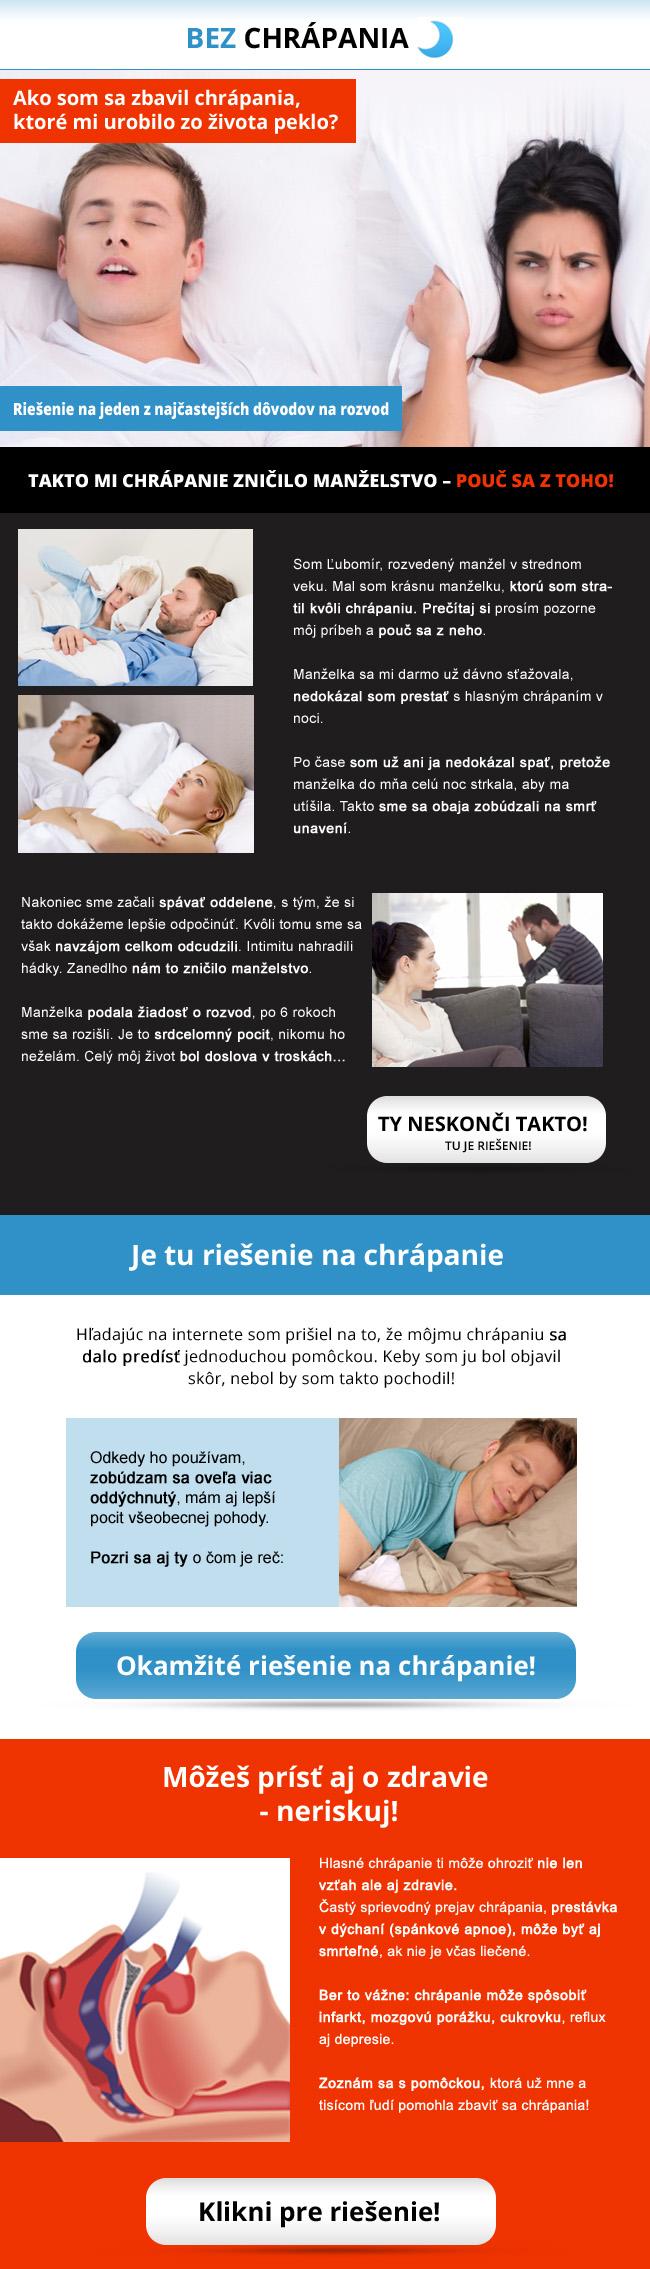 stop-chrapaniu